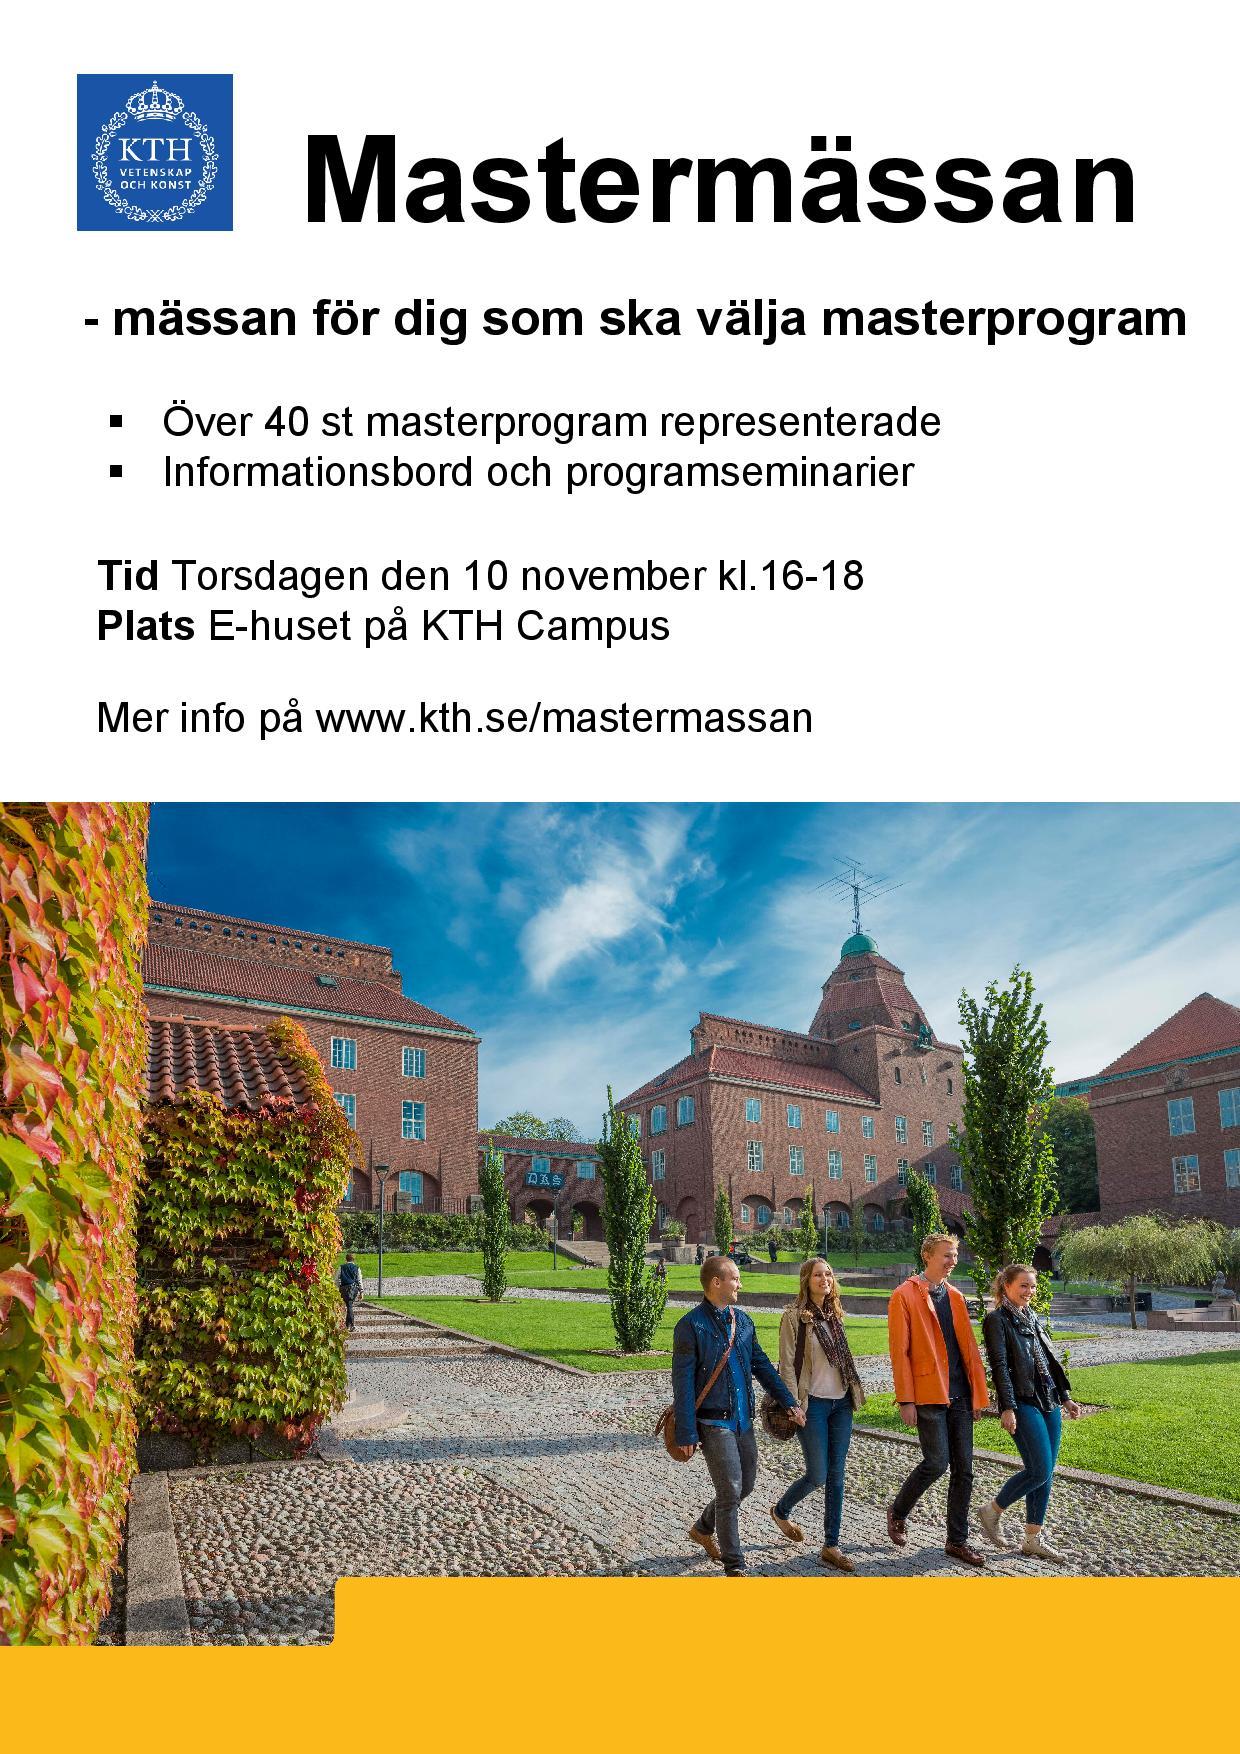 mastermassan-2016